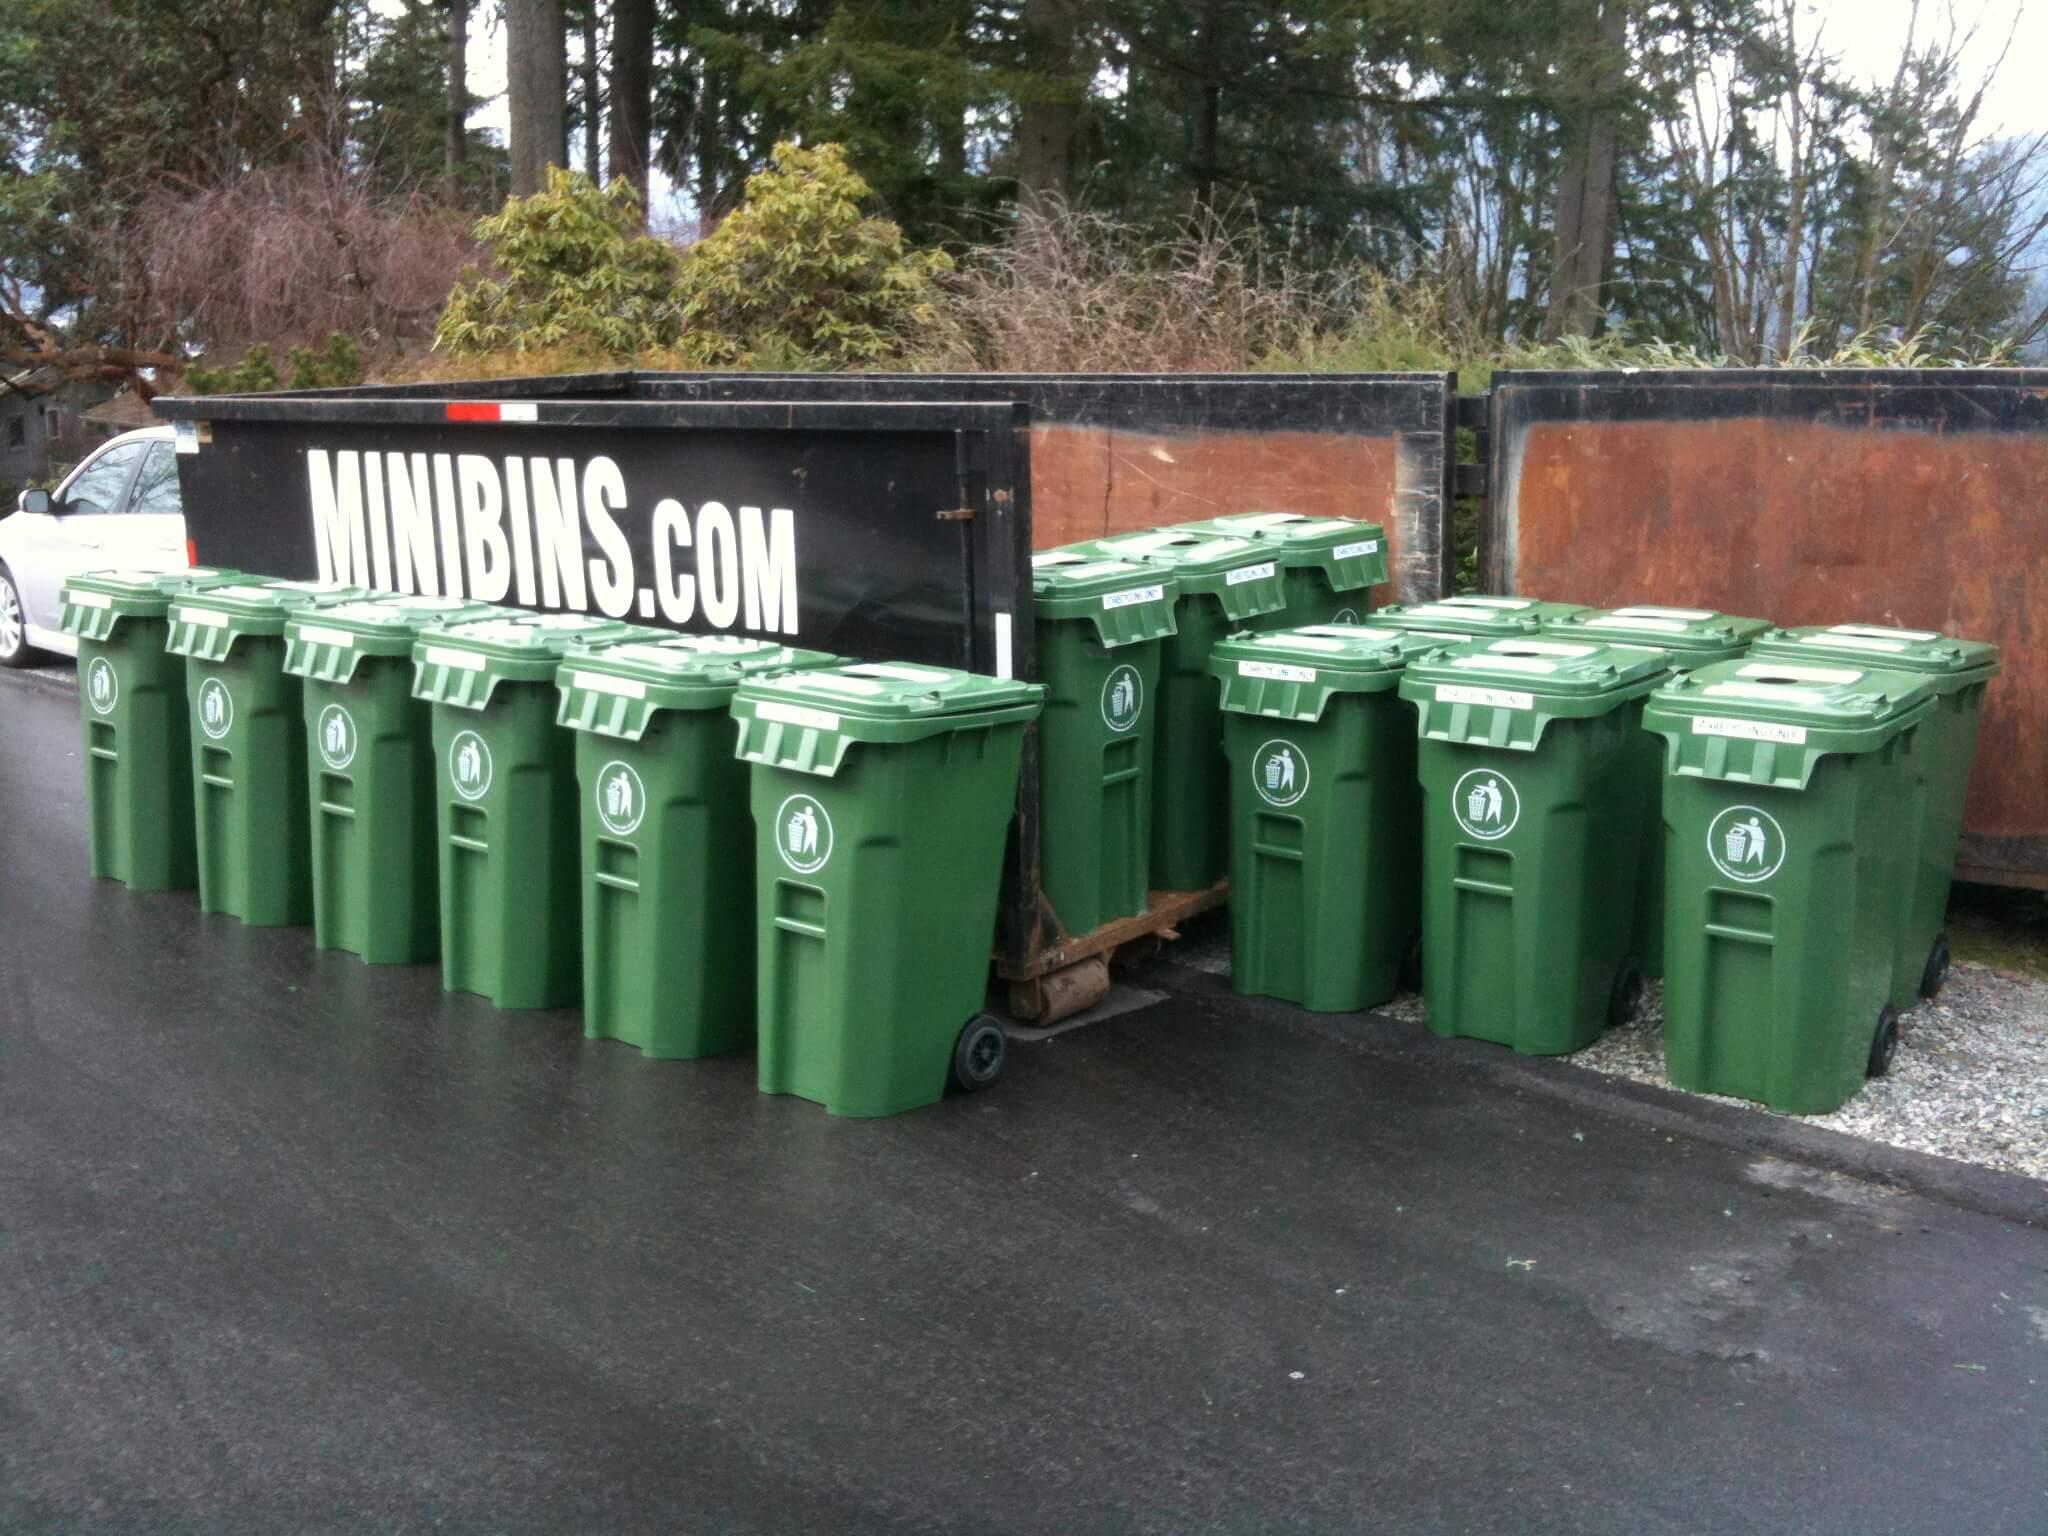 Minibins disposal recycling bin rental